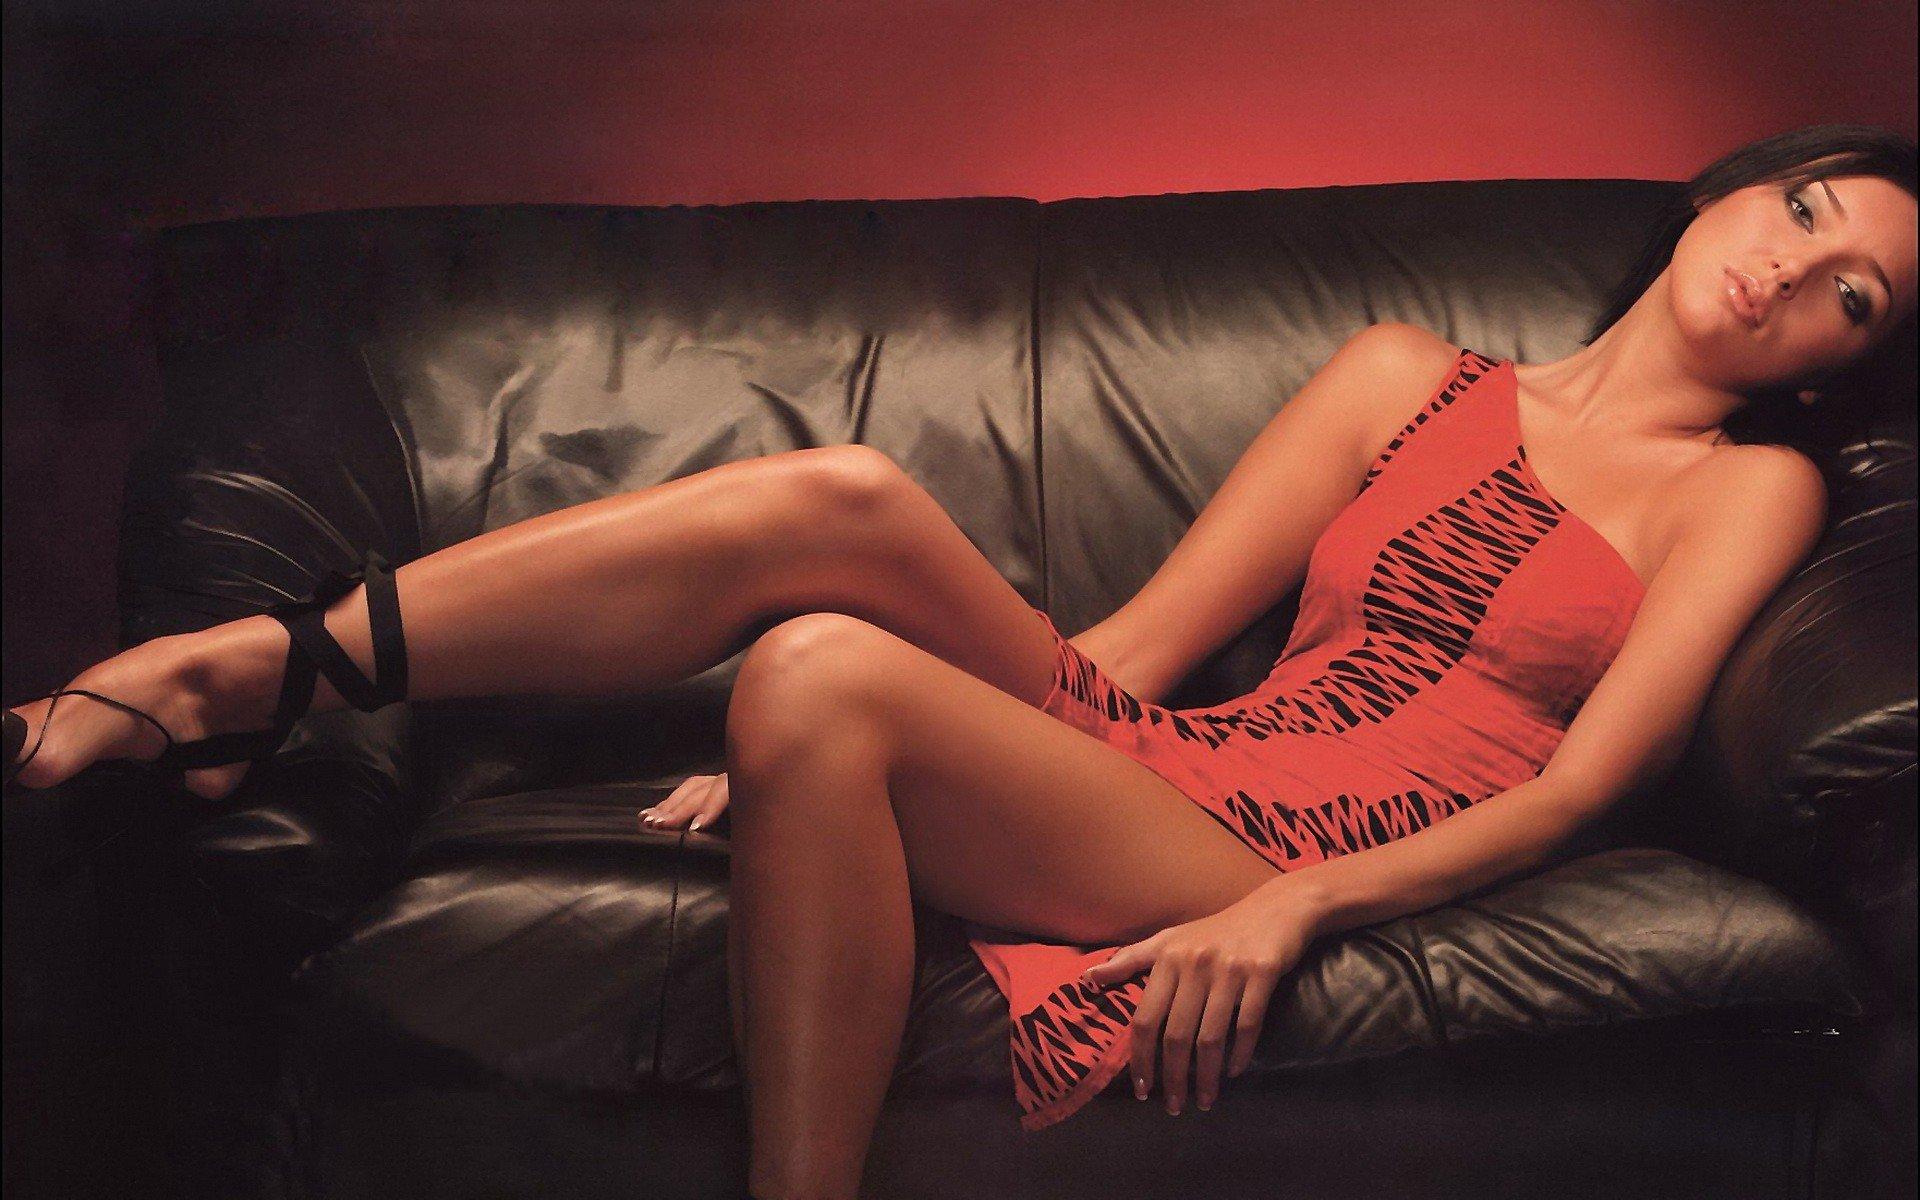 Девушка брюнетка на диване  № 651746 бесплатно